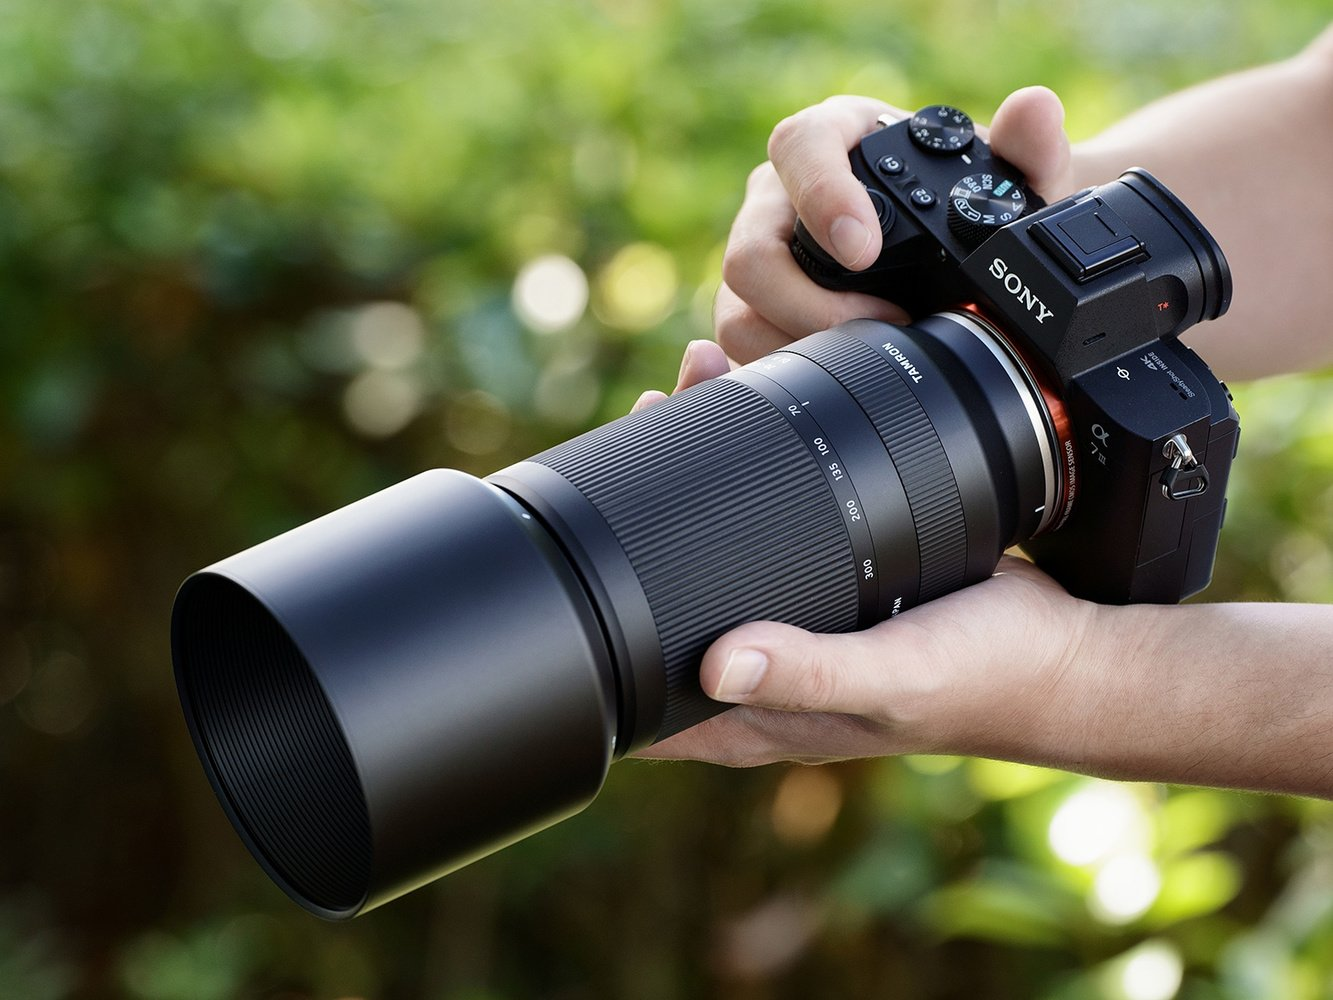 Tamron 70-300 mm f/4.5-6.3 Sony E